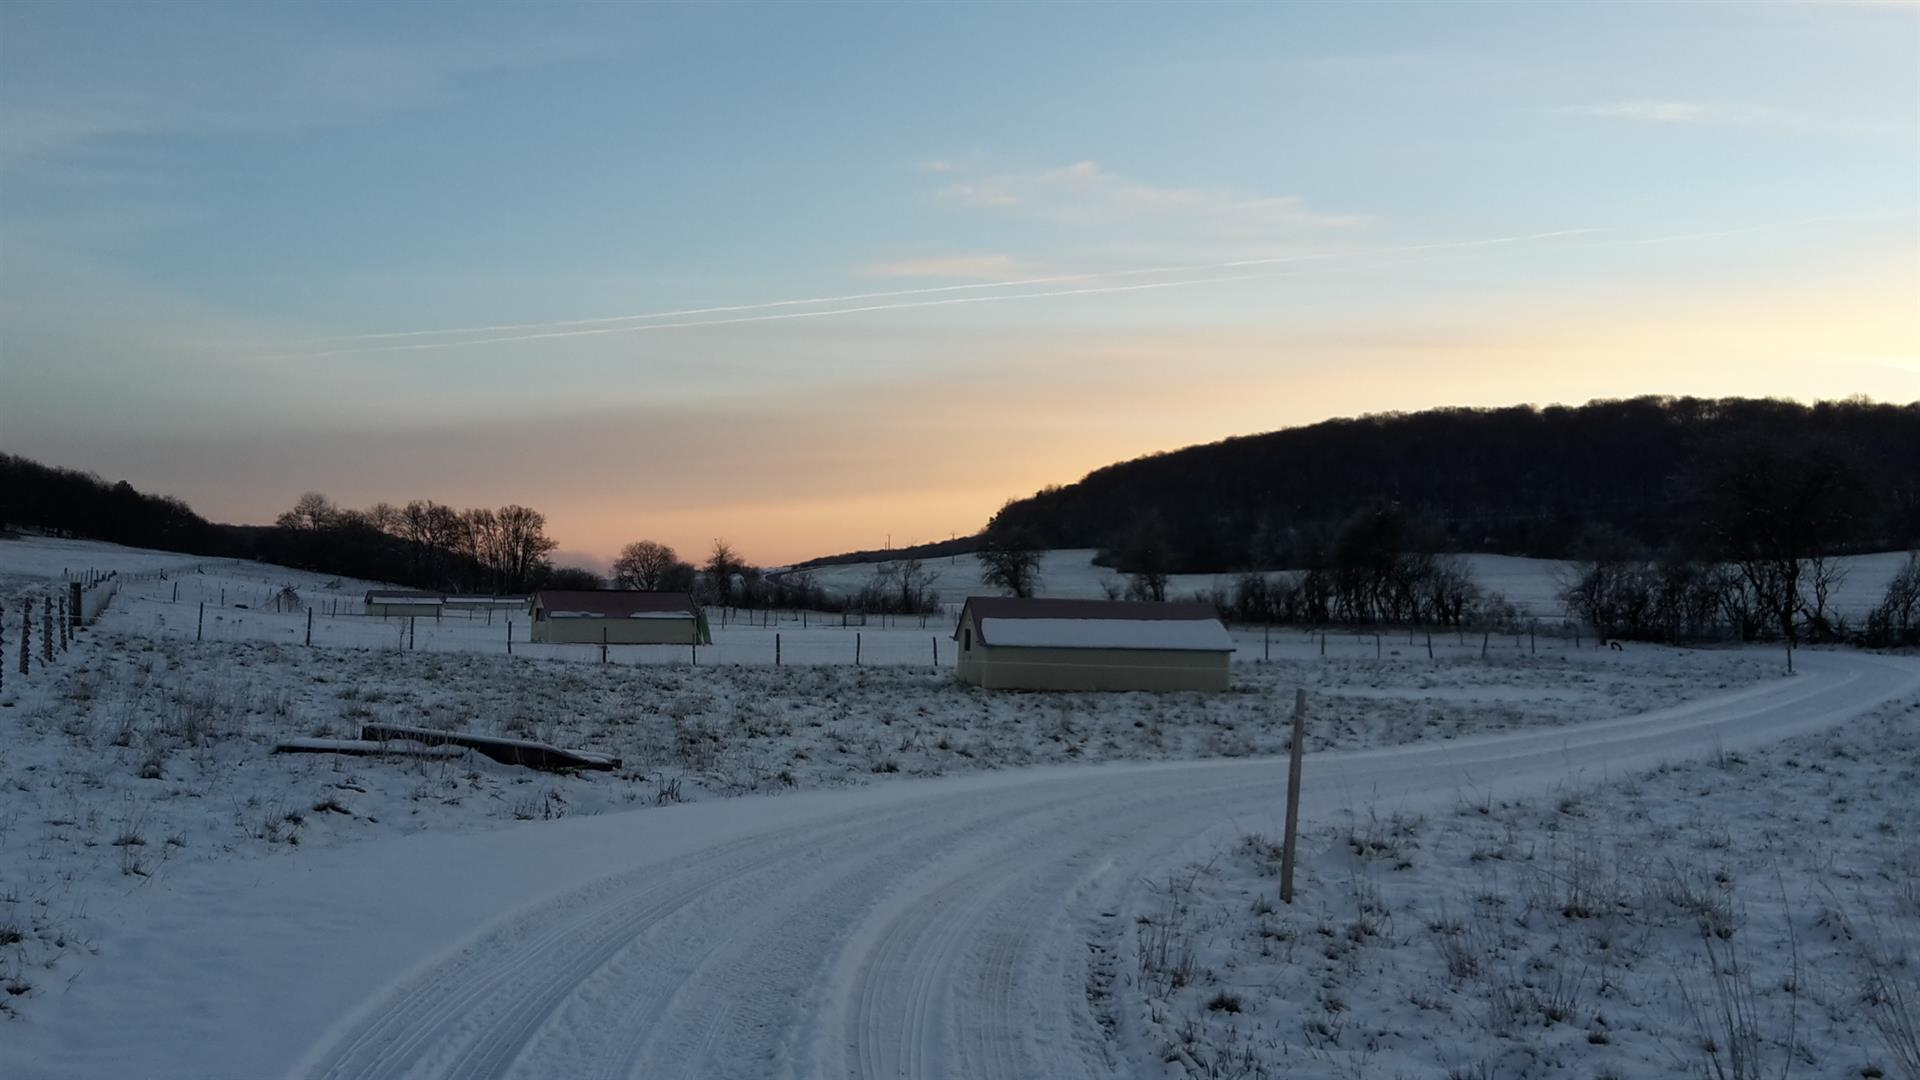 En hiver! - DPR-FERME DU POISET